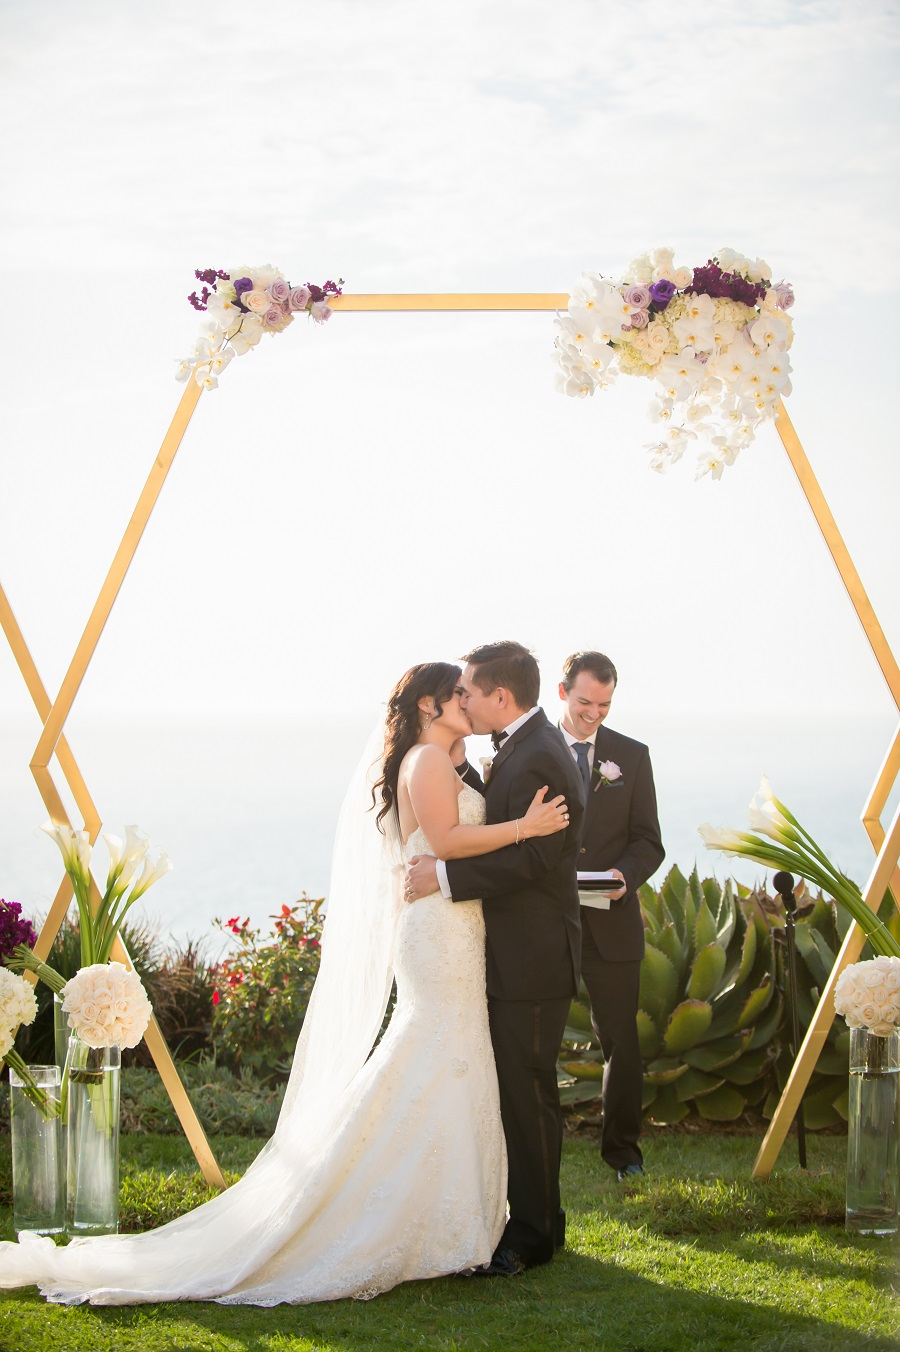 Ritz Carlton Laguna Niguel Wedding, ME Weddings, Flowers by Cina, KLK Photography, Lin and Jirsa, white wedding, seaside wedding